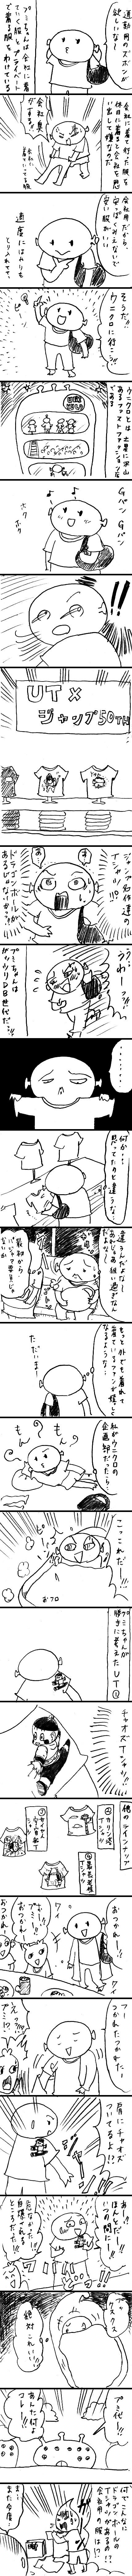 WEB漫画・土星人!プミちゃん「UT×ジャンプ×プミちゃん」